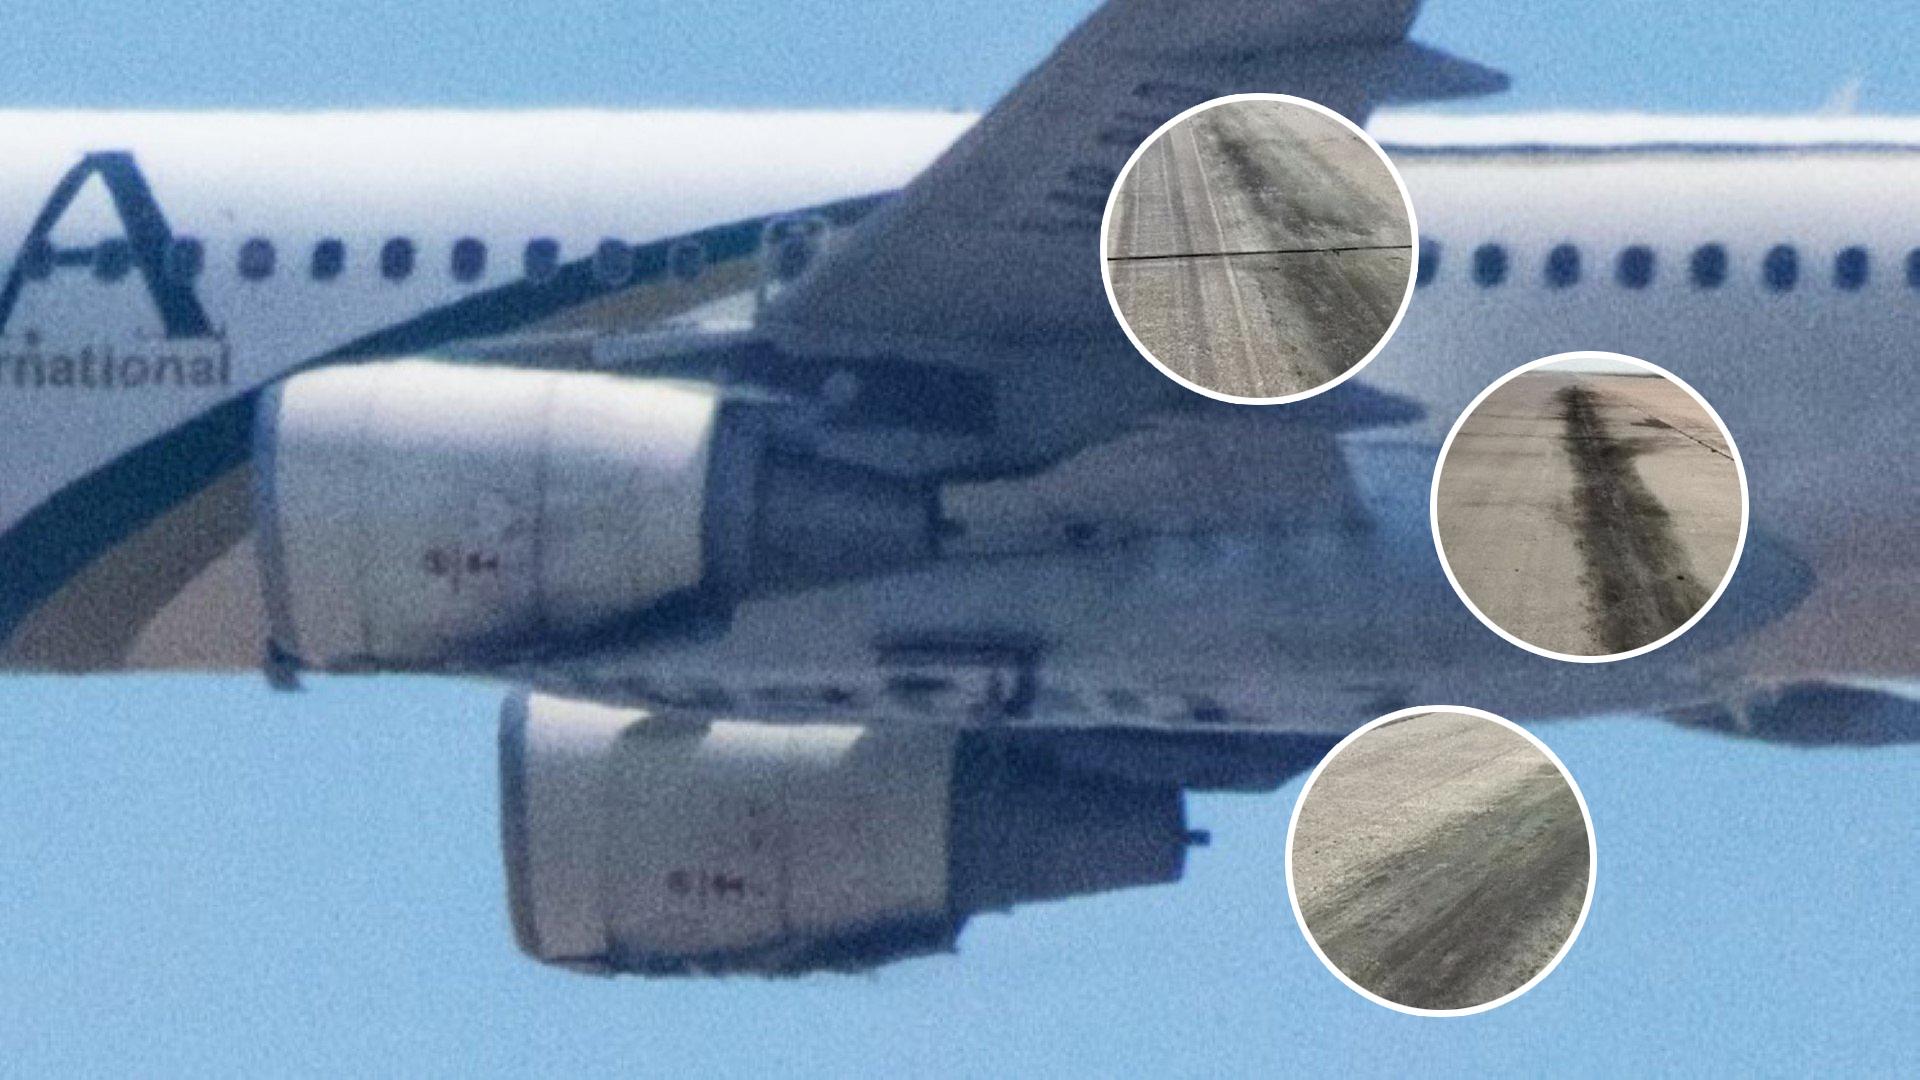 [Imagen: PIA-A320-MOTORES-ACCIDENTE-PISTA-1.jpg]